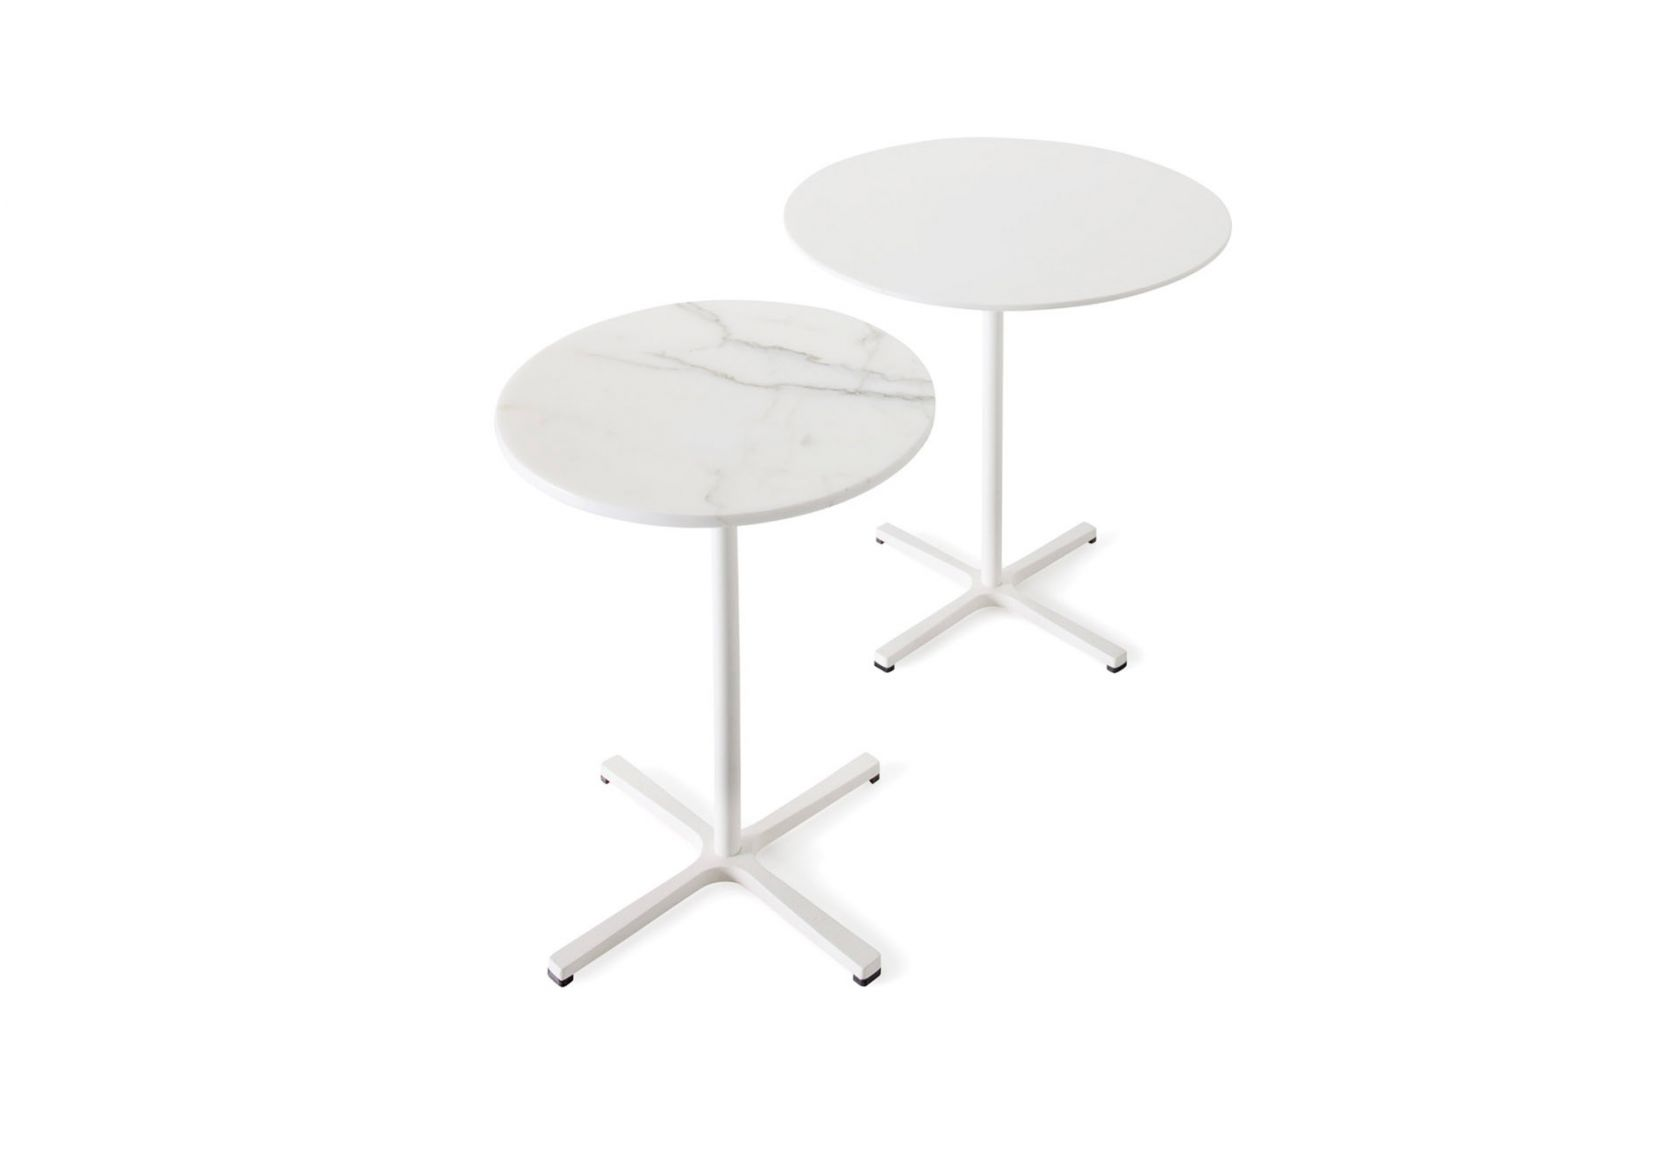 Krossi double Table